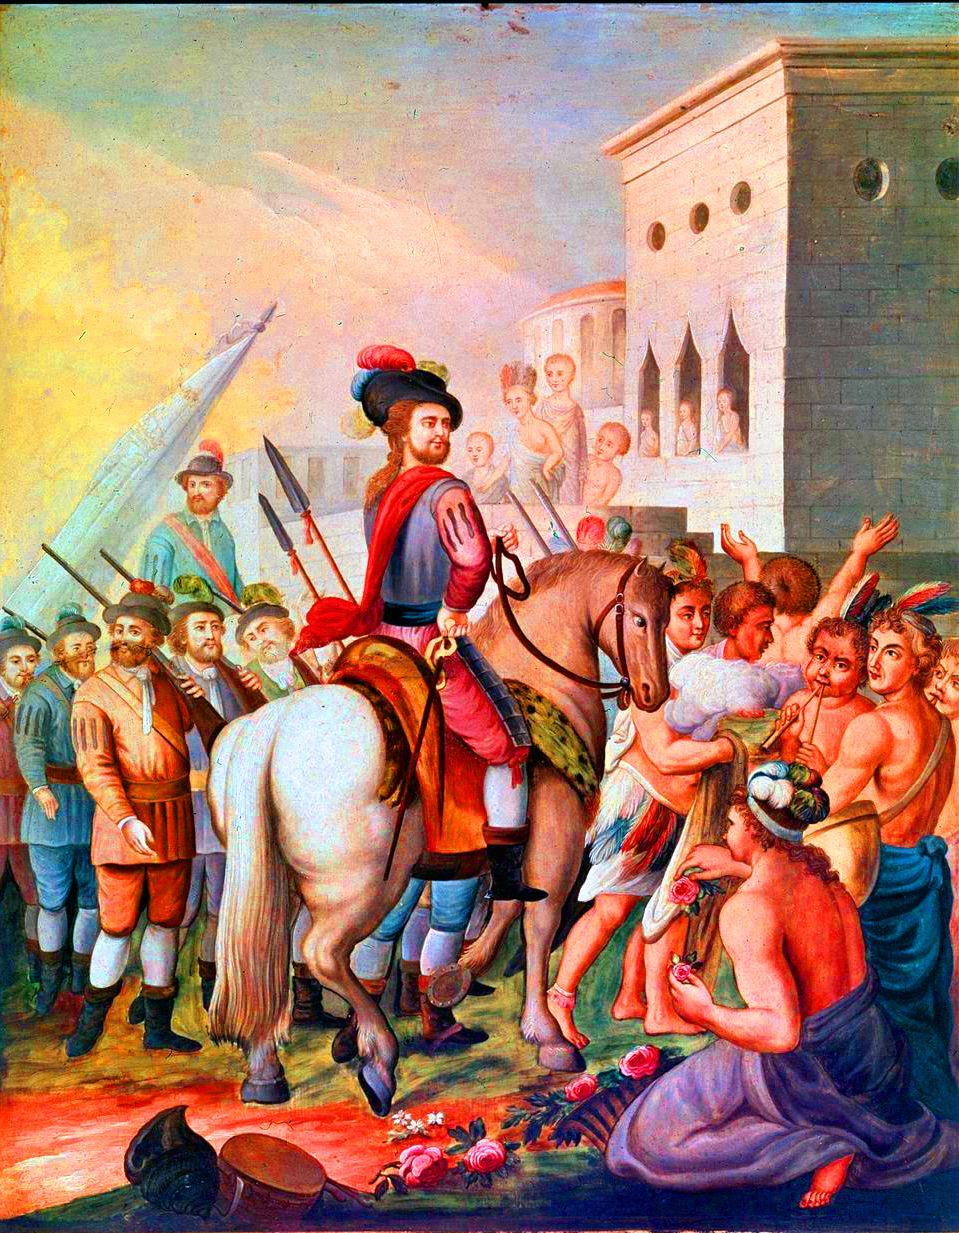 Hernán Cortés in Mexico